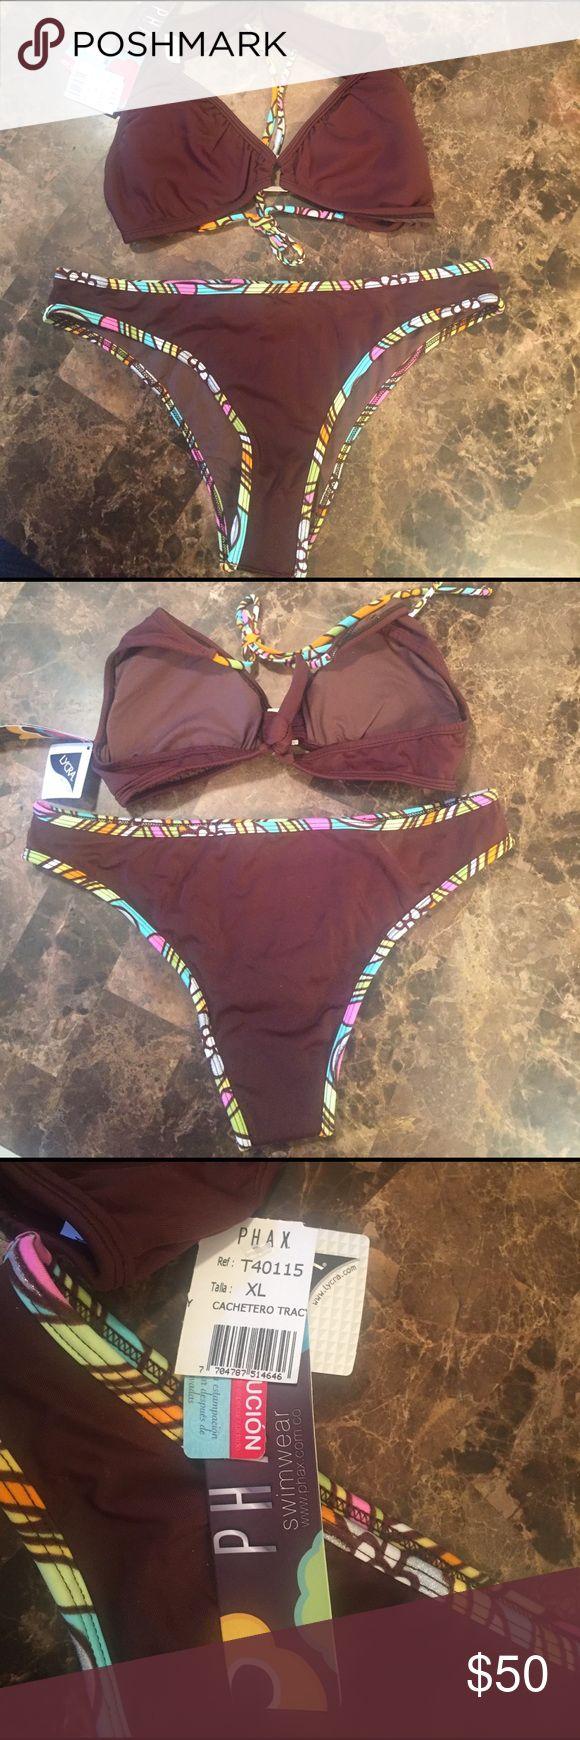 Very cute brown 2 piece PHAX bikini Very cute brown 2 piece PHAX bikini, famous colombian brand ! Enhance your figure with molded foam cups on the top & a sexy moderate rear coverage ! PHAX  Swim Bikinis